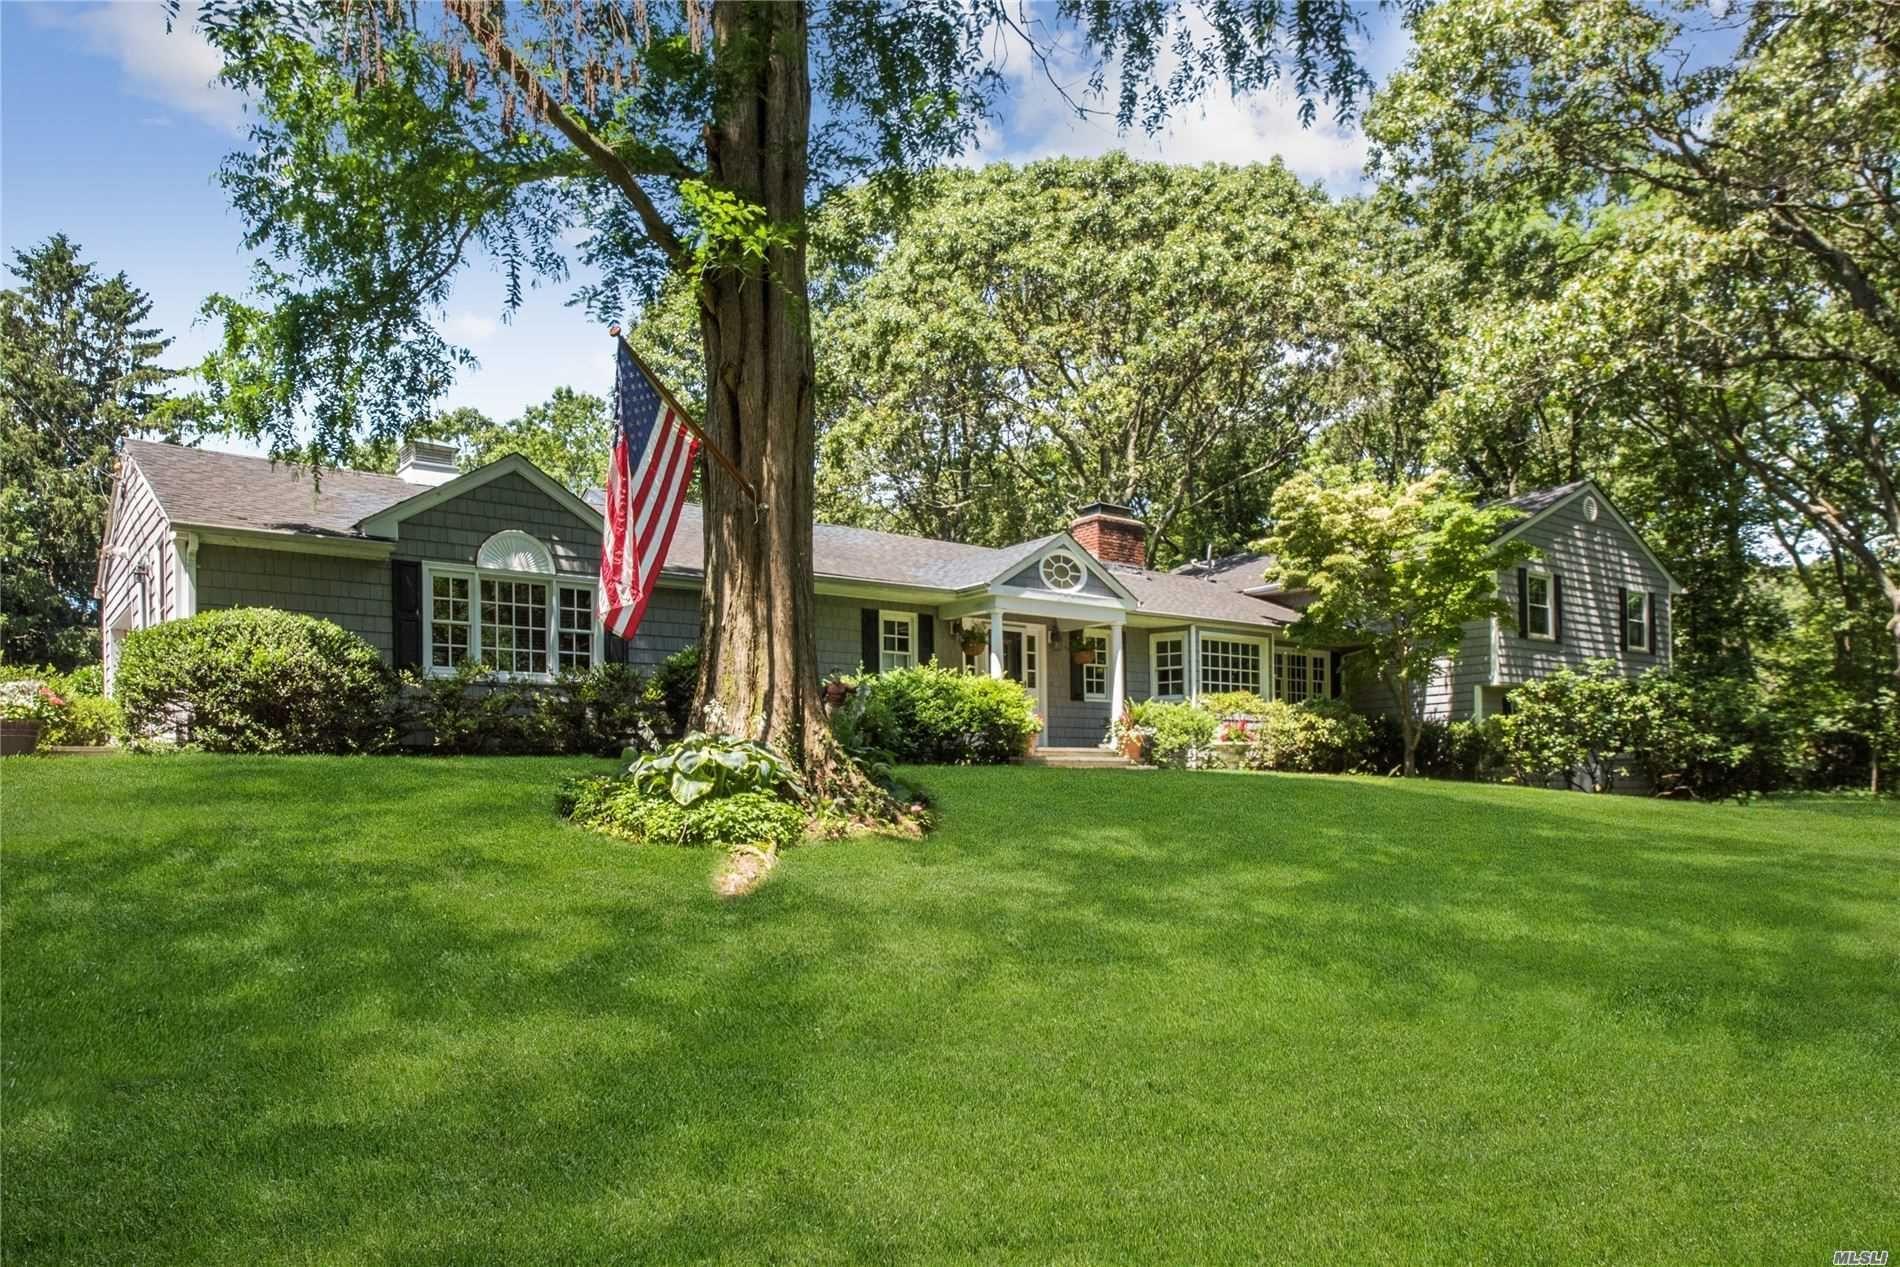 Photo of 49 White Oak Tree Rd, Laurel Hollow, NY 11791 (MLS # 3231529)